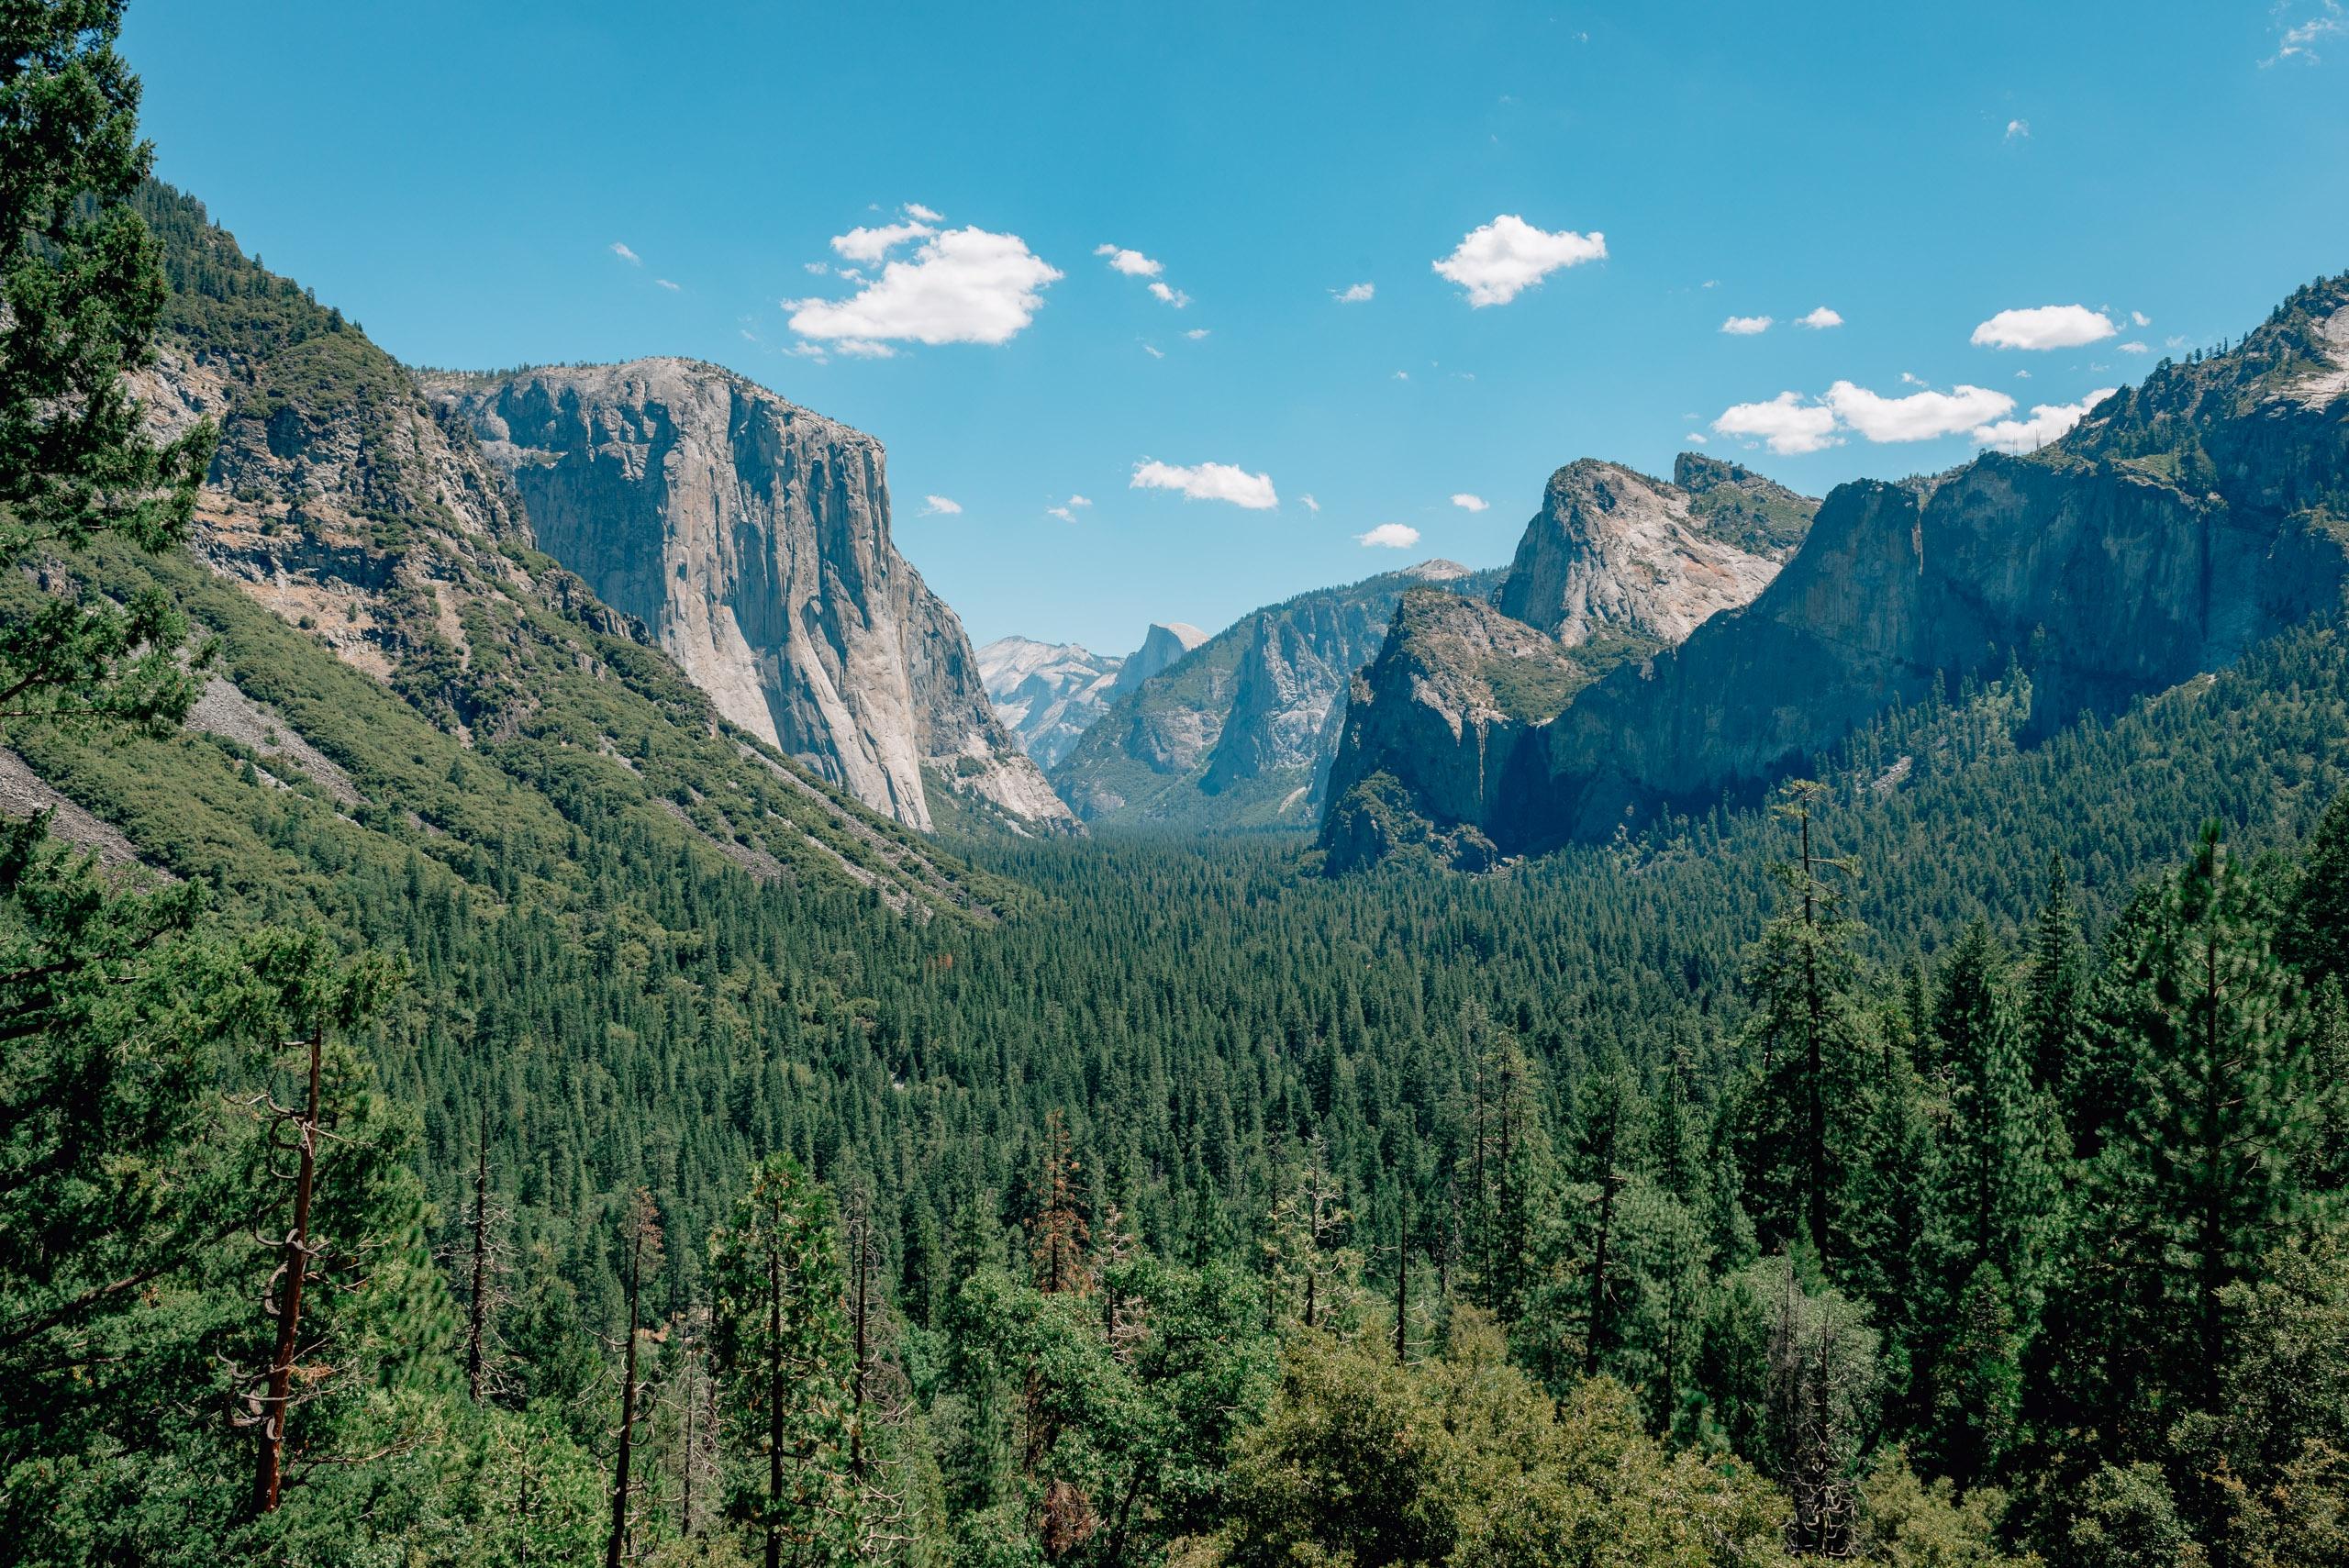 Yosemite National Park - 2012 - 2012-0721-DSC_0099